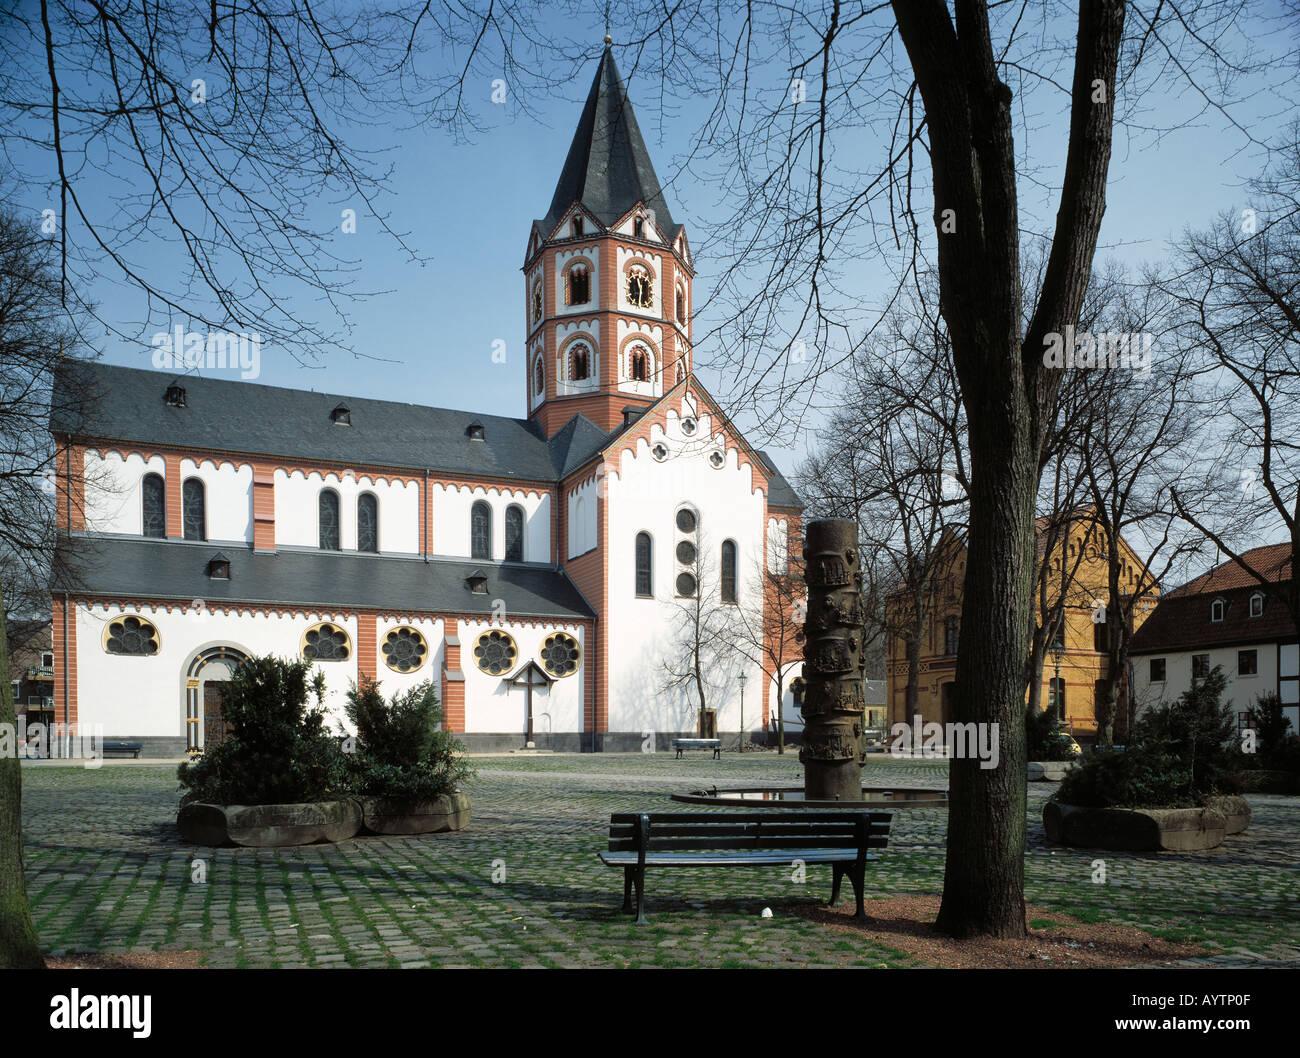 kirche sankt margareta in duesseldorf gerresheim rhein stock photo royalty free image 5608974. Black Bedroom Furniture Sets. Home Design Ideas